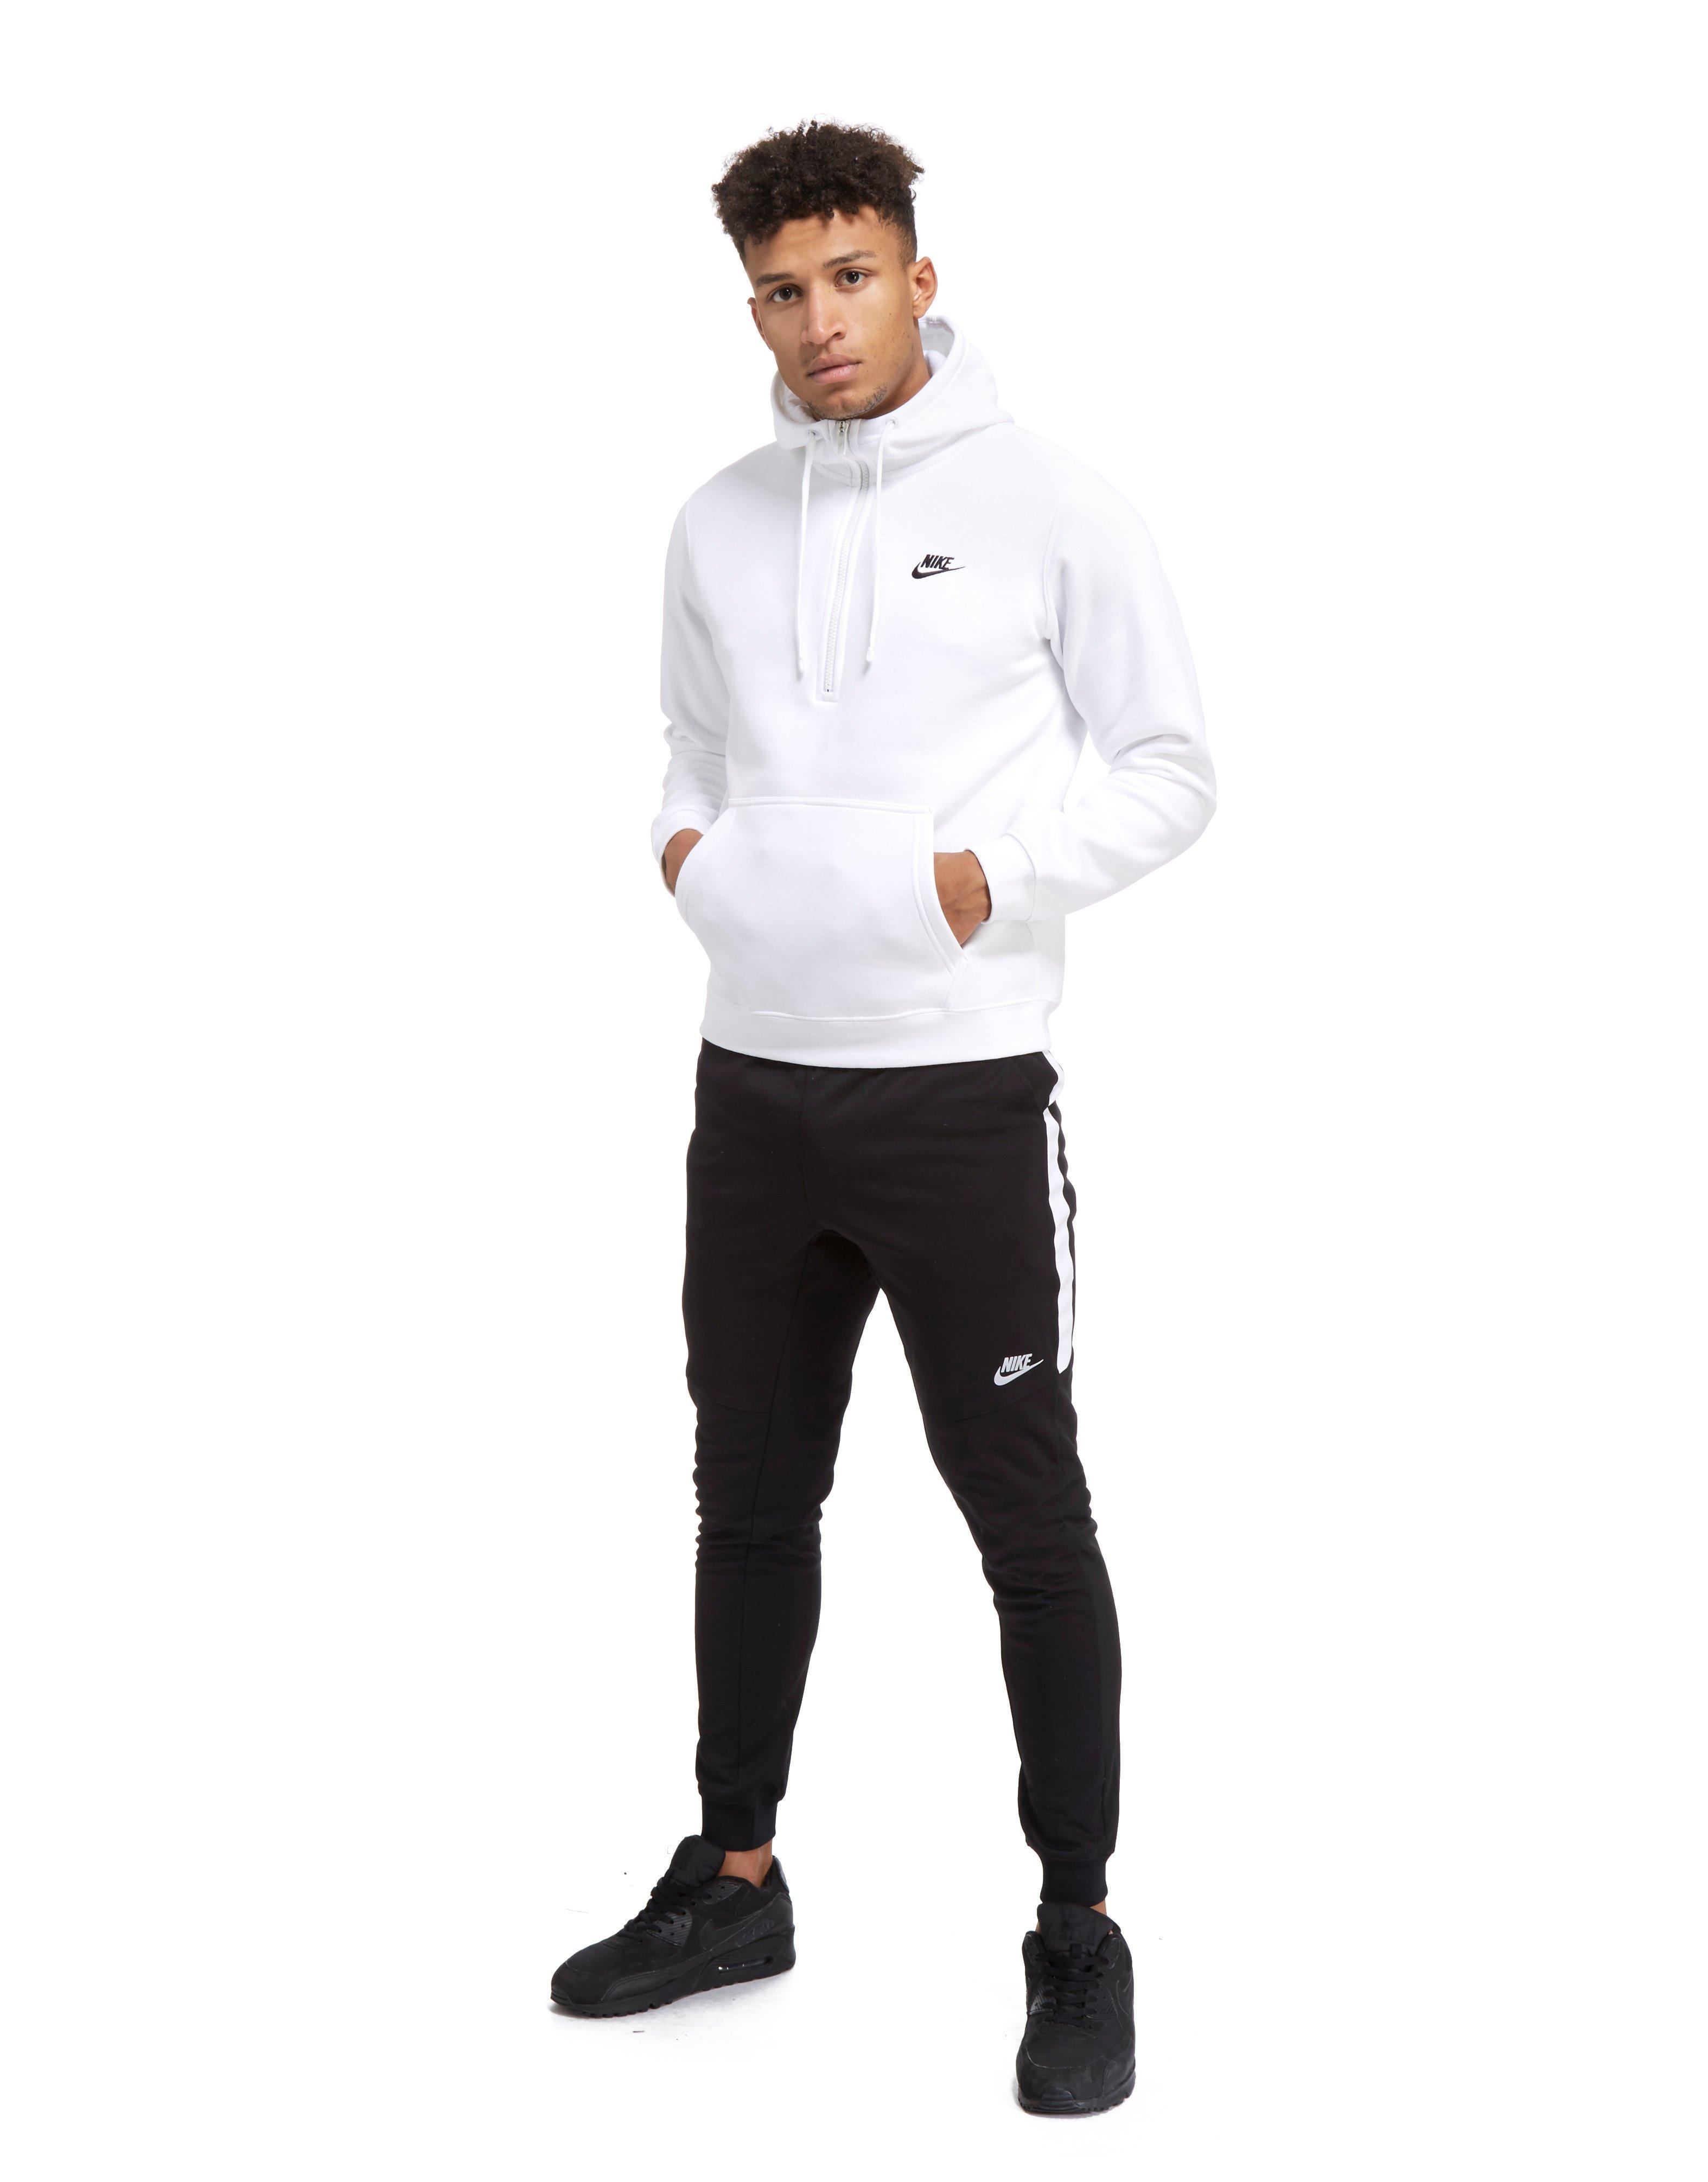 f80a0ec2ca Nike Tribute Dc Pants in Black for Men - Lyst